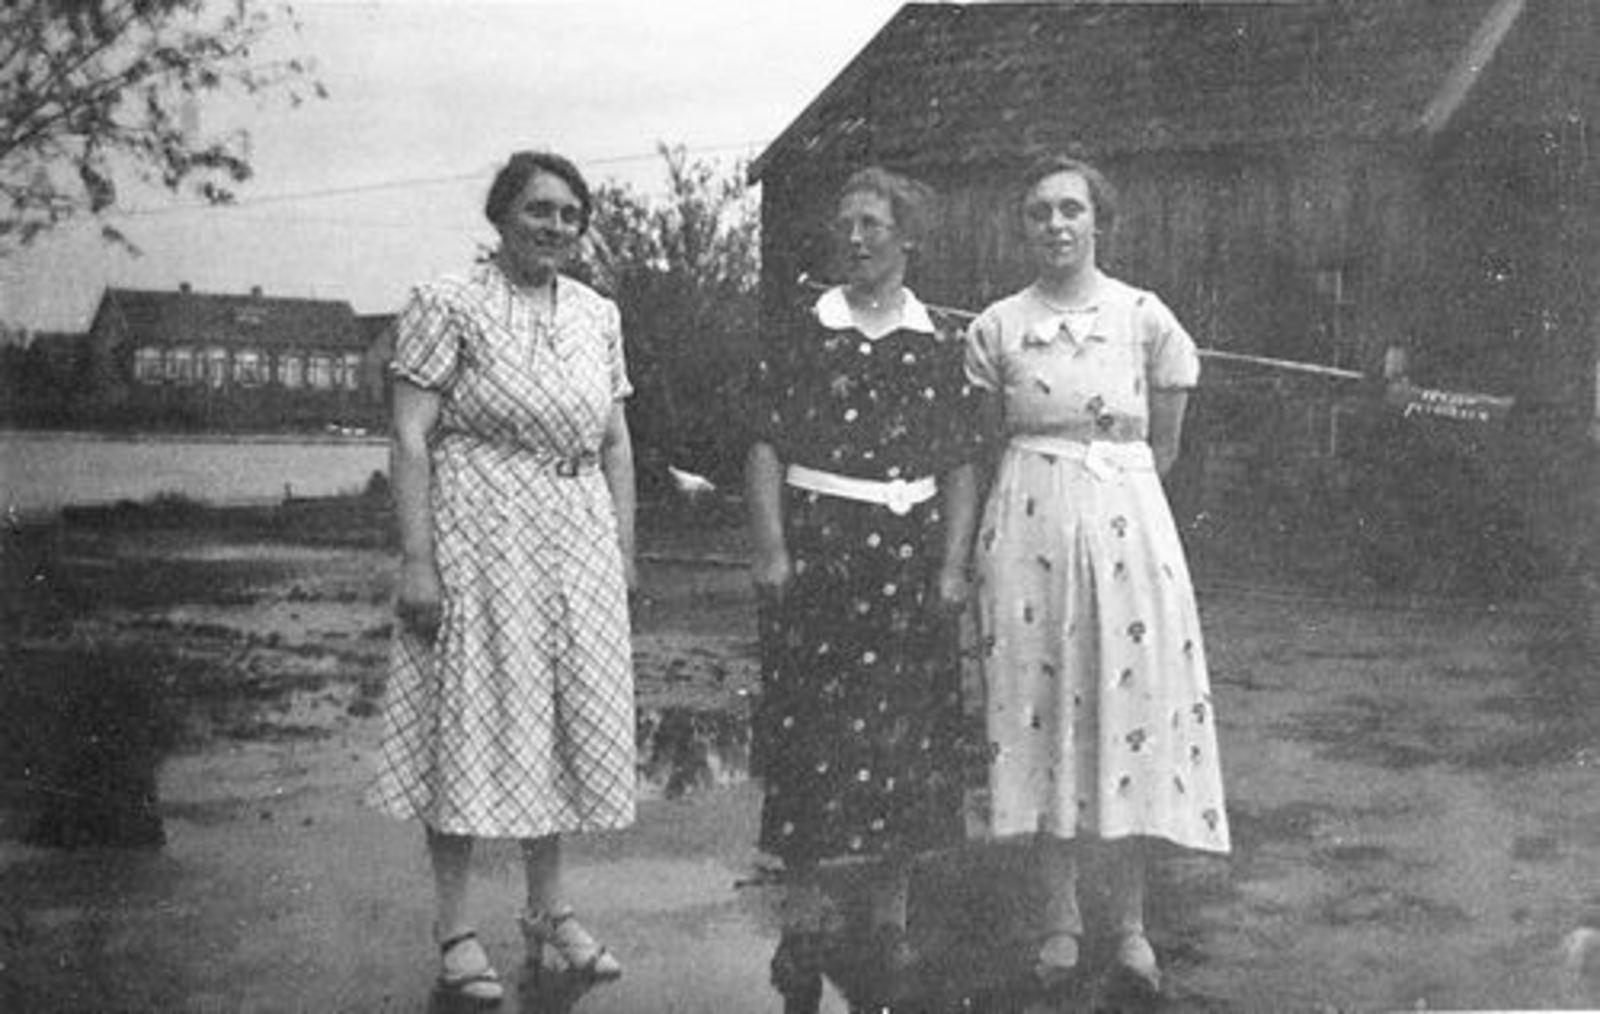 <b>ZOEKPLAATJE:</b>&nbsp;Elshout Hendrika 1921 19__ met Onbekend op Erf